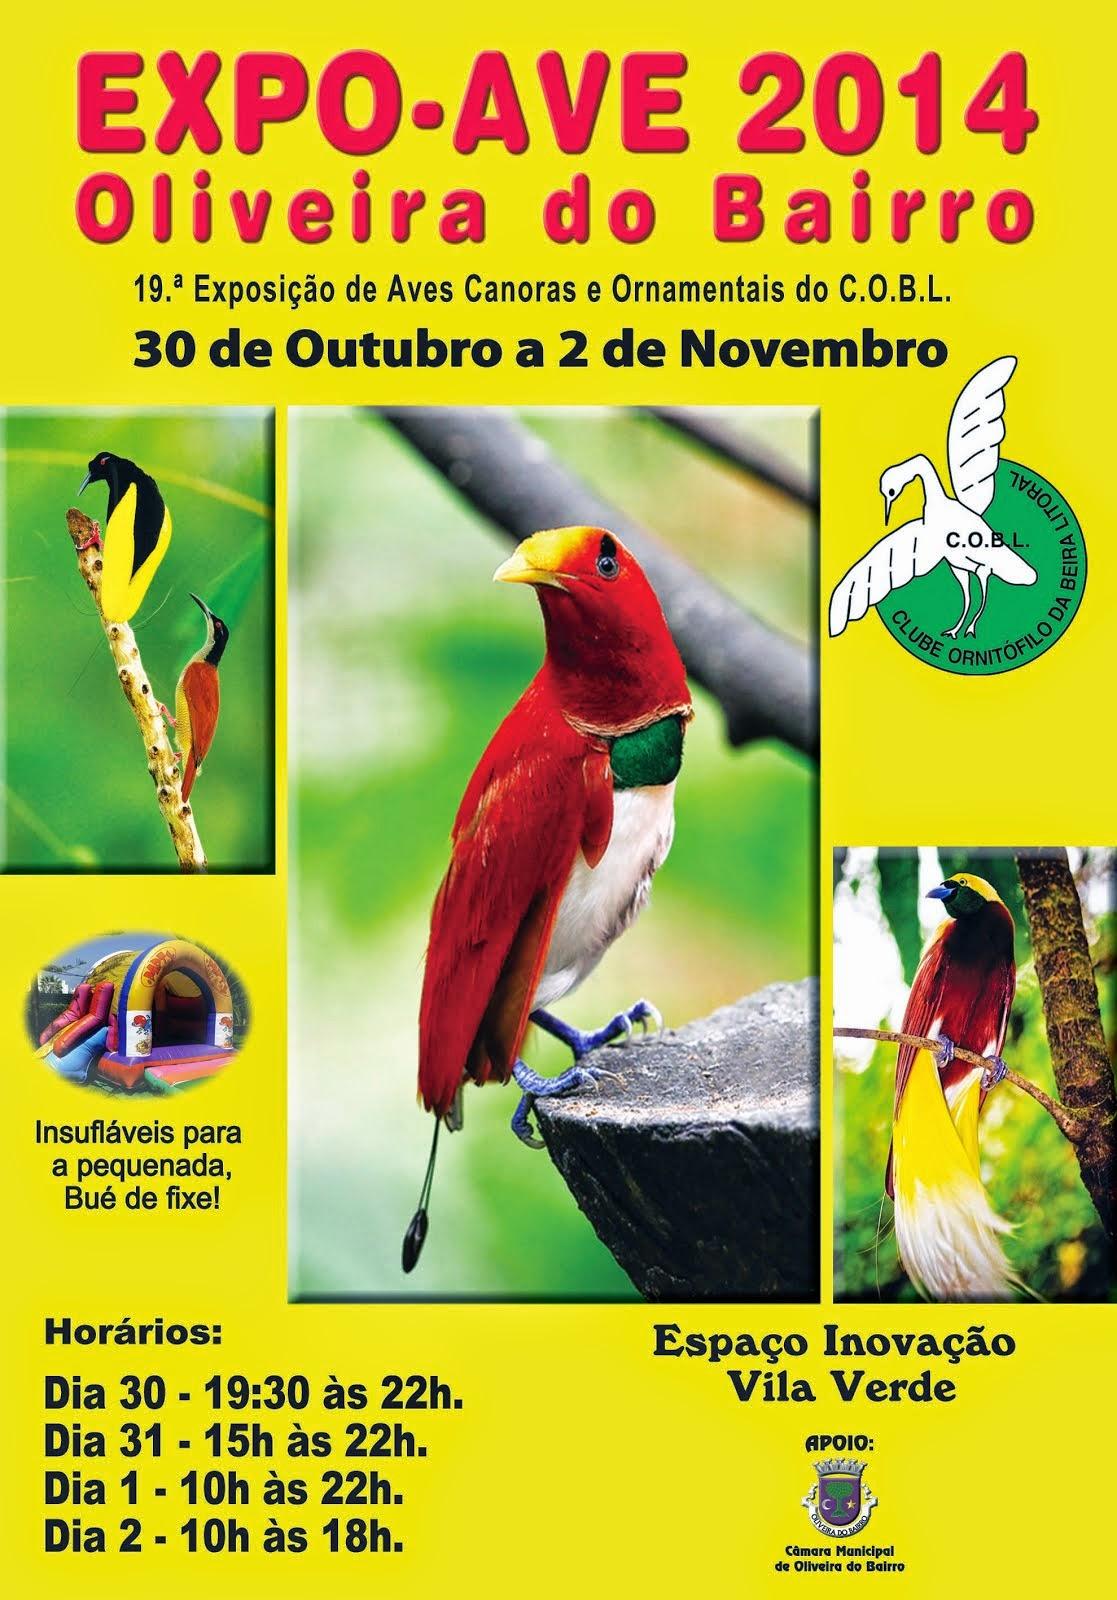 EXPO-AVE OLIVEIRA DO BAIRRO 2014